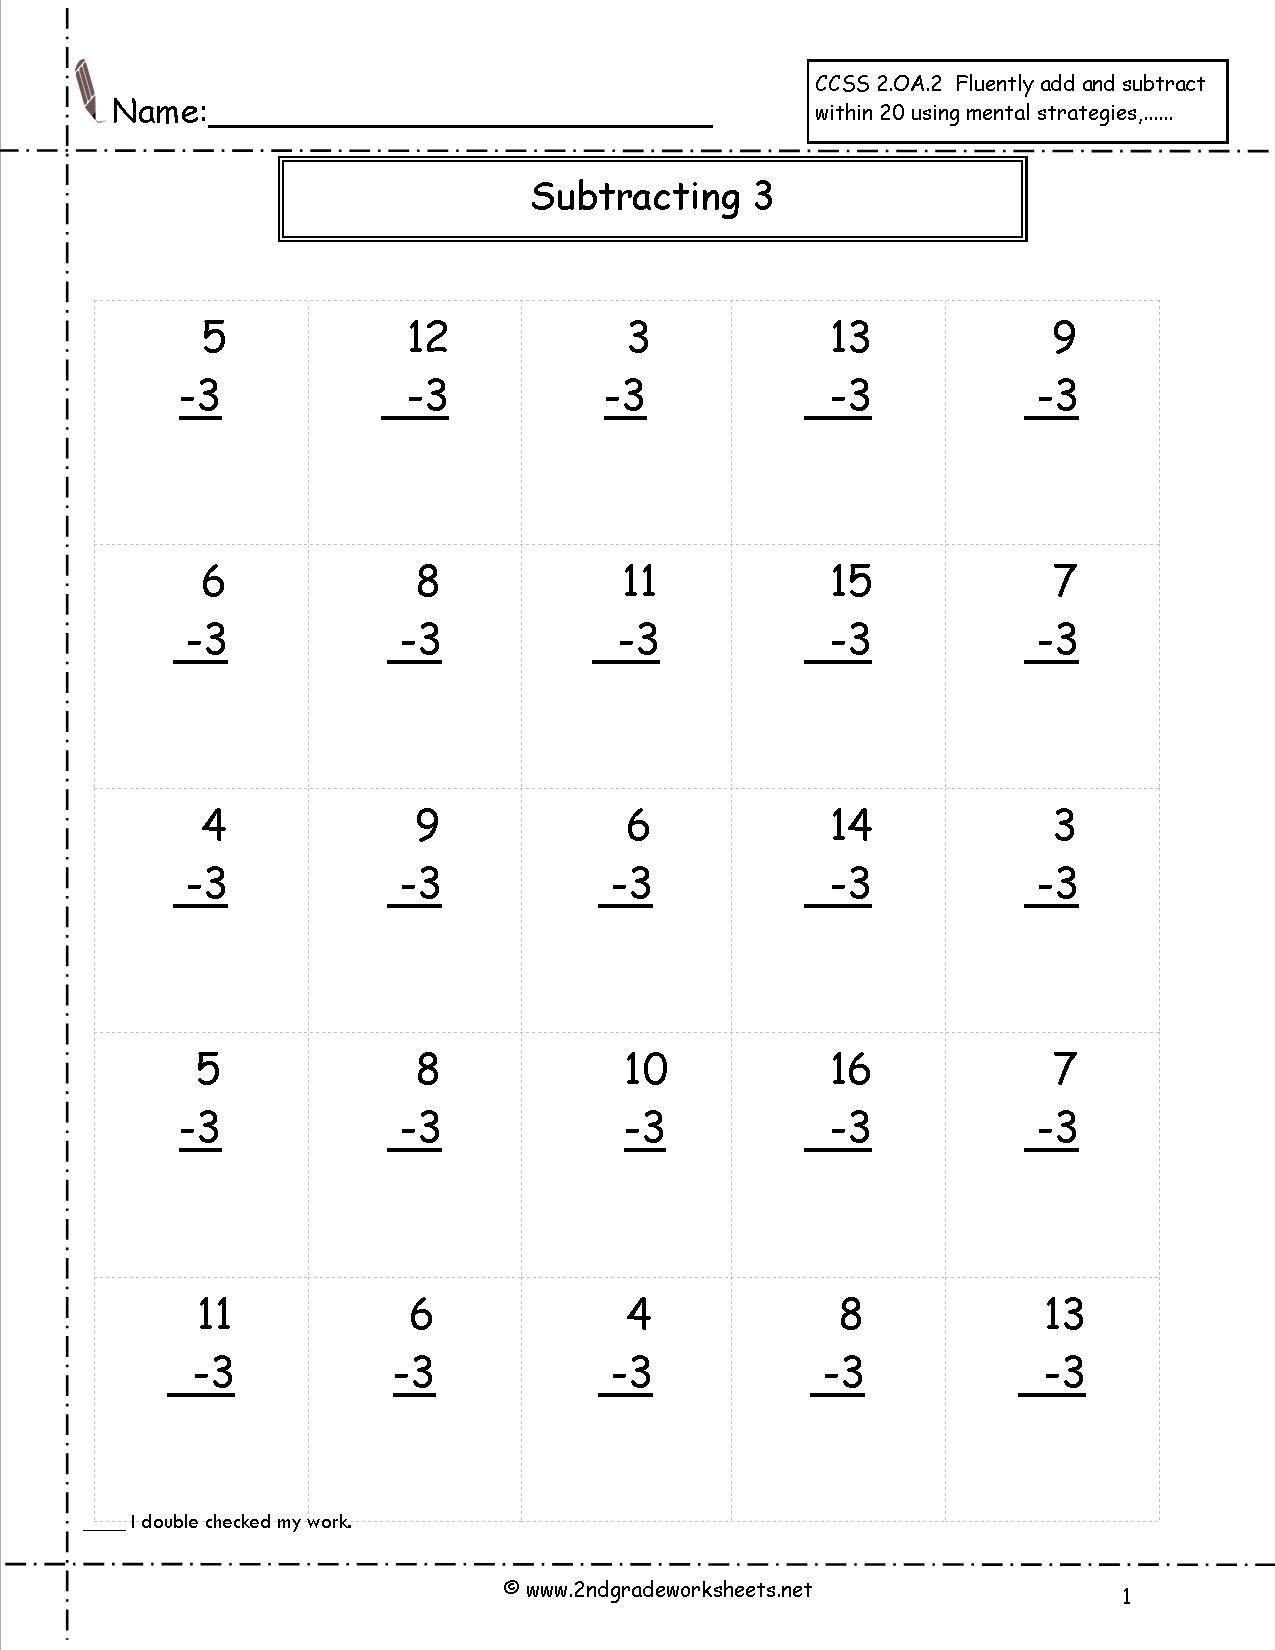 Saxon Math Second Grade Worksheets Second Grade Math Worksheets In 2020 Subtraction Worksheets Free Math Worksheets Math Worksheets